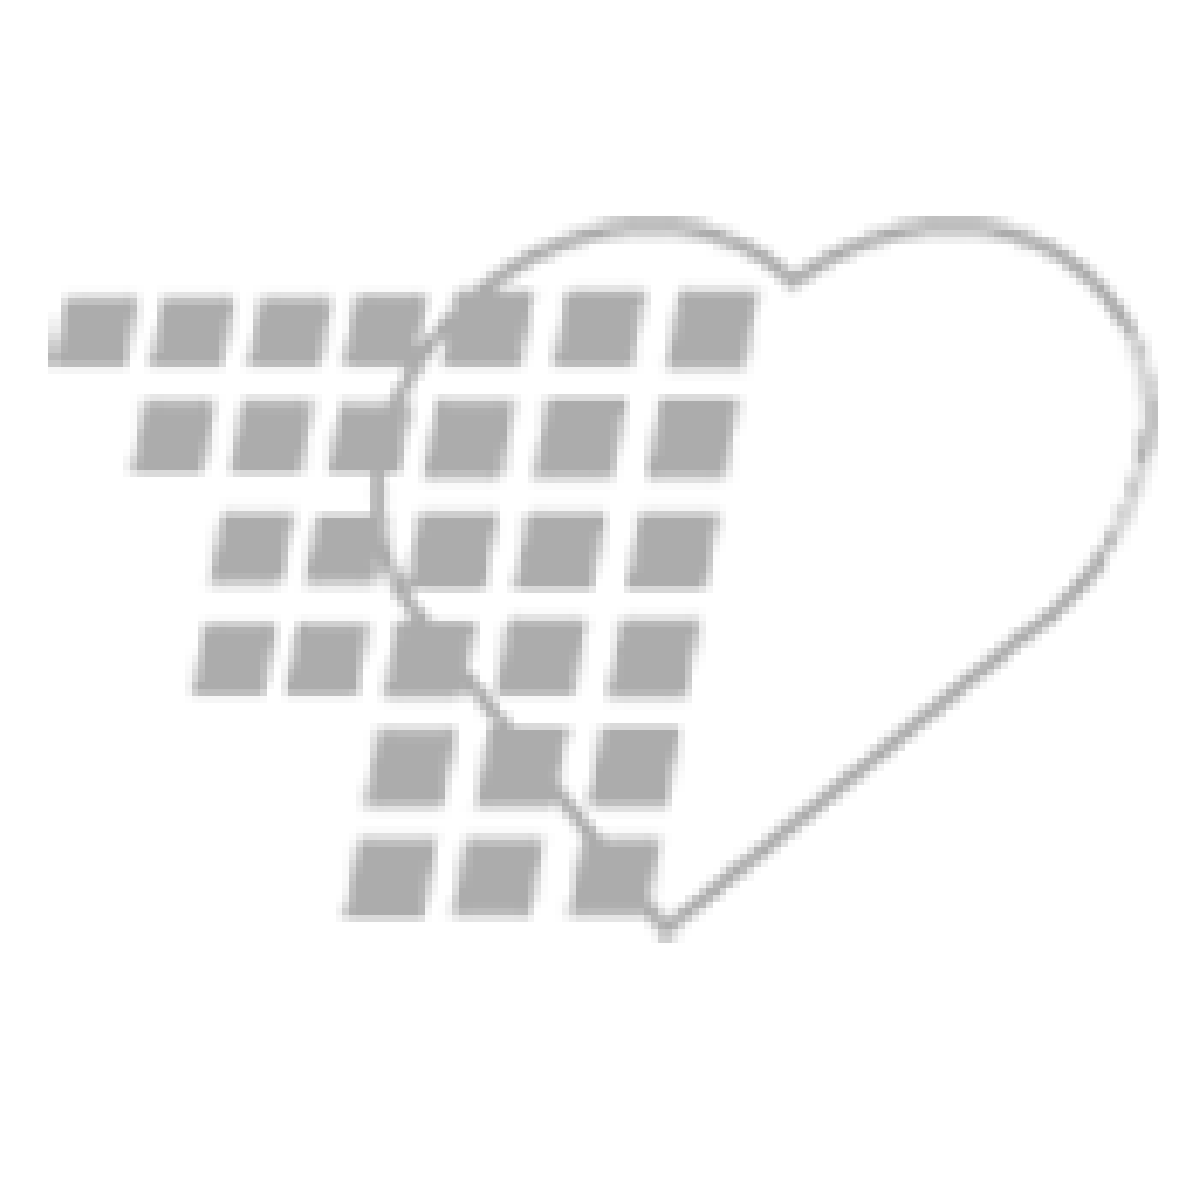 06-93-0084 - Demo Dose® Levaqun 500 mg - 100 Pills/Bottle